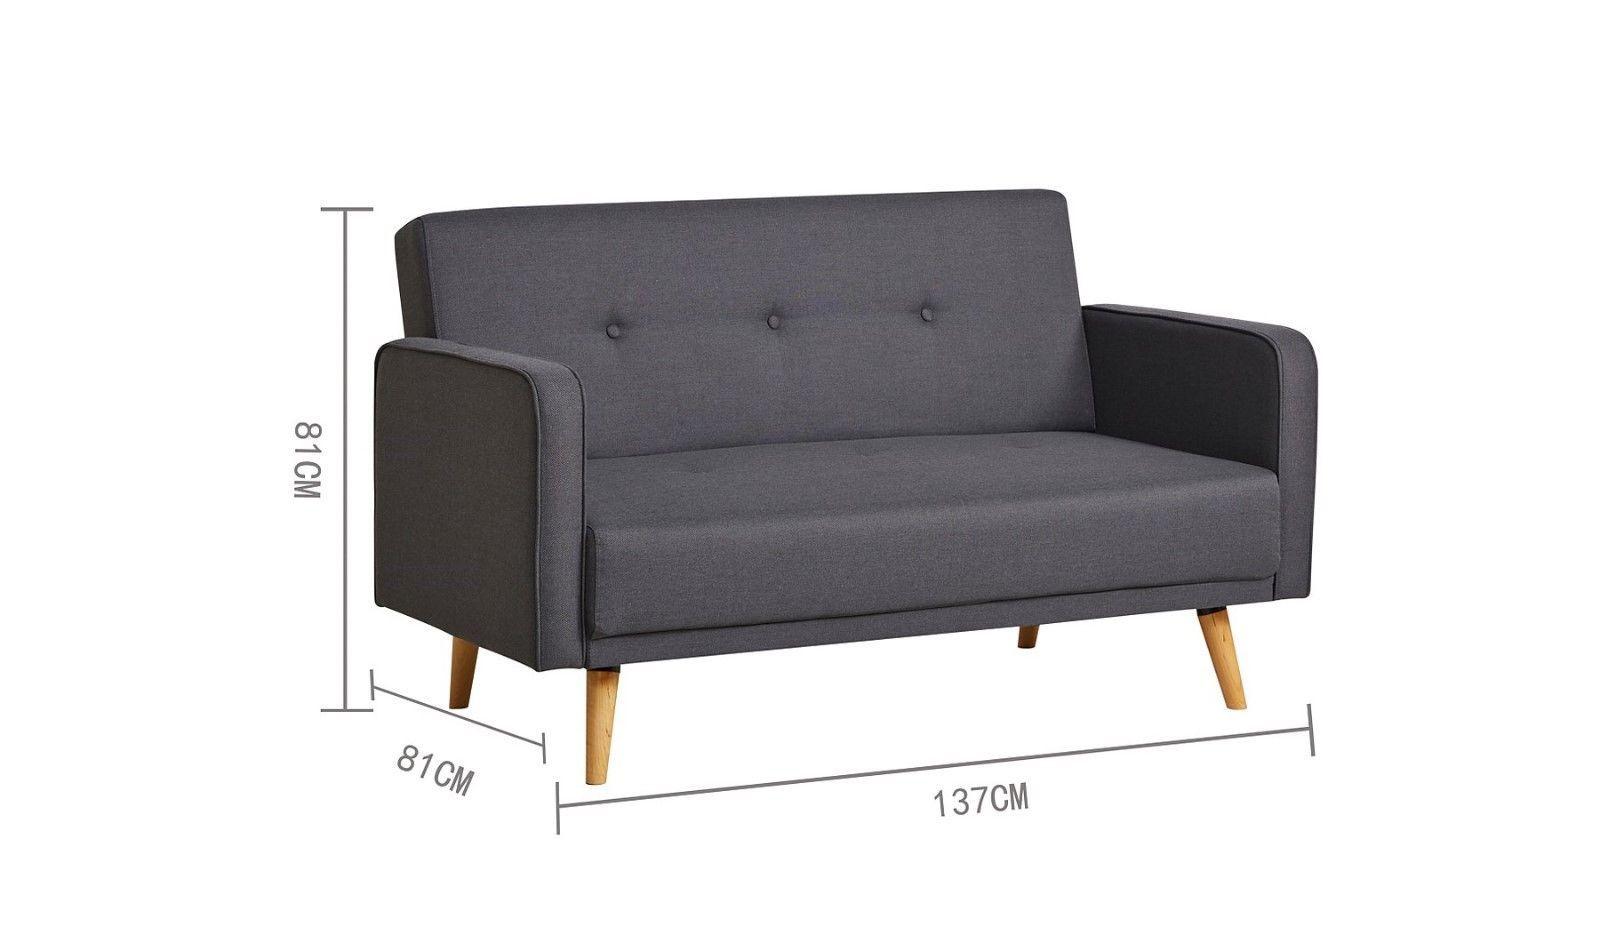 Ramona Contemporary Compact Sofa Charcoal Exdisplay Ebay Sofa Bed Design Scandinavian Sofa Design Compact Sofas